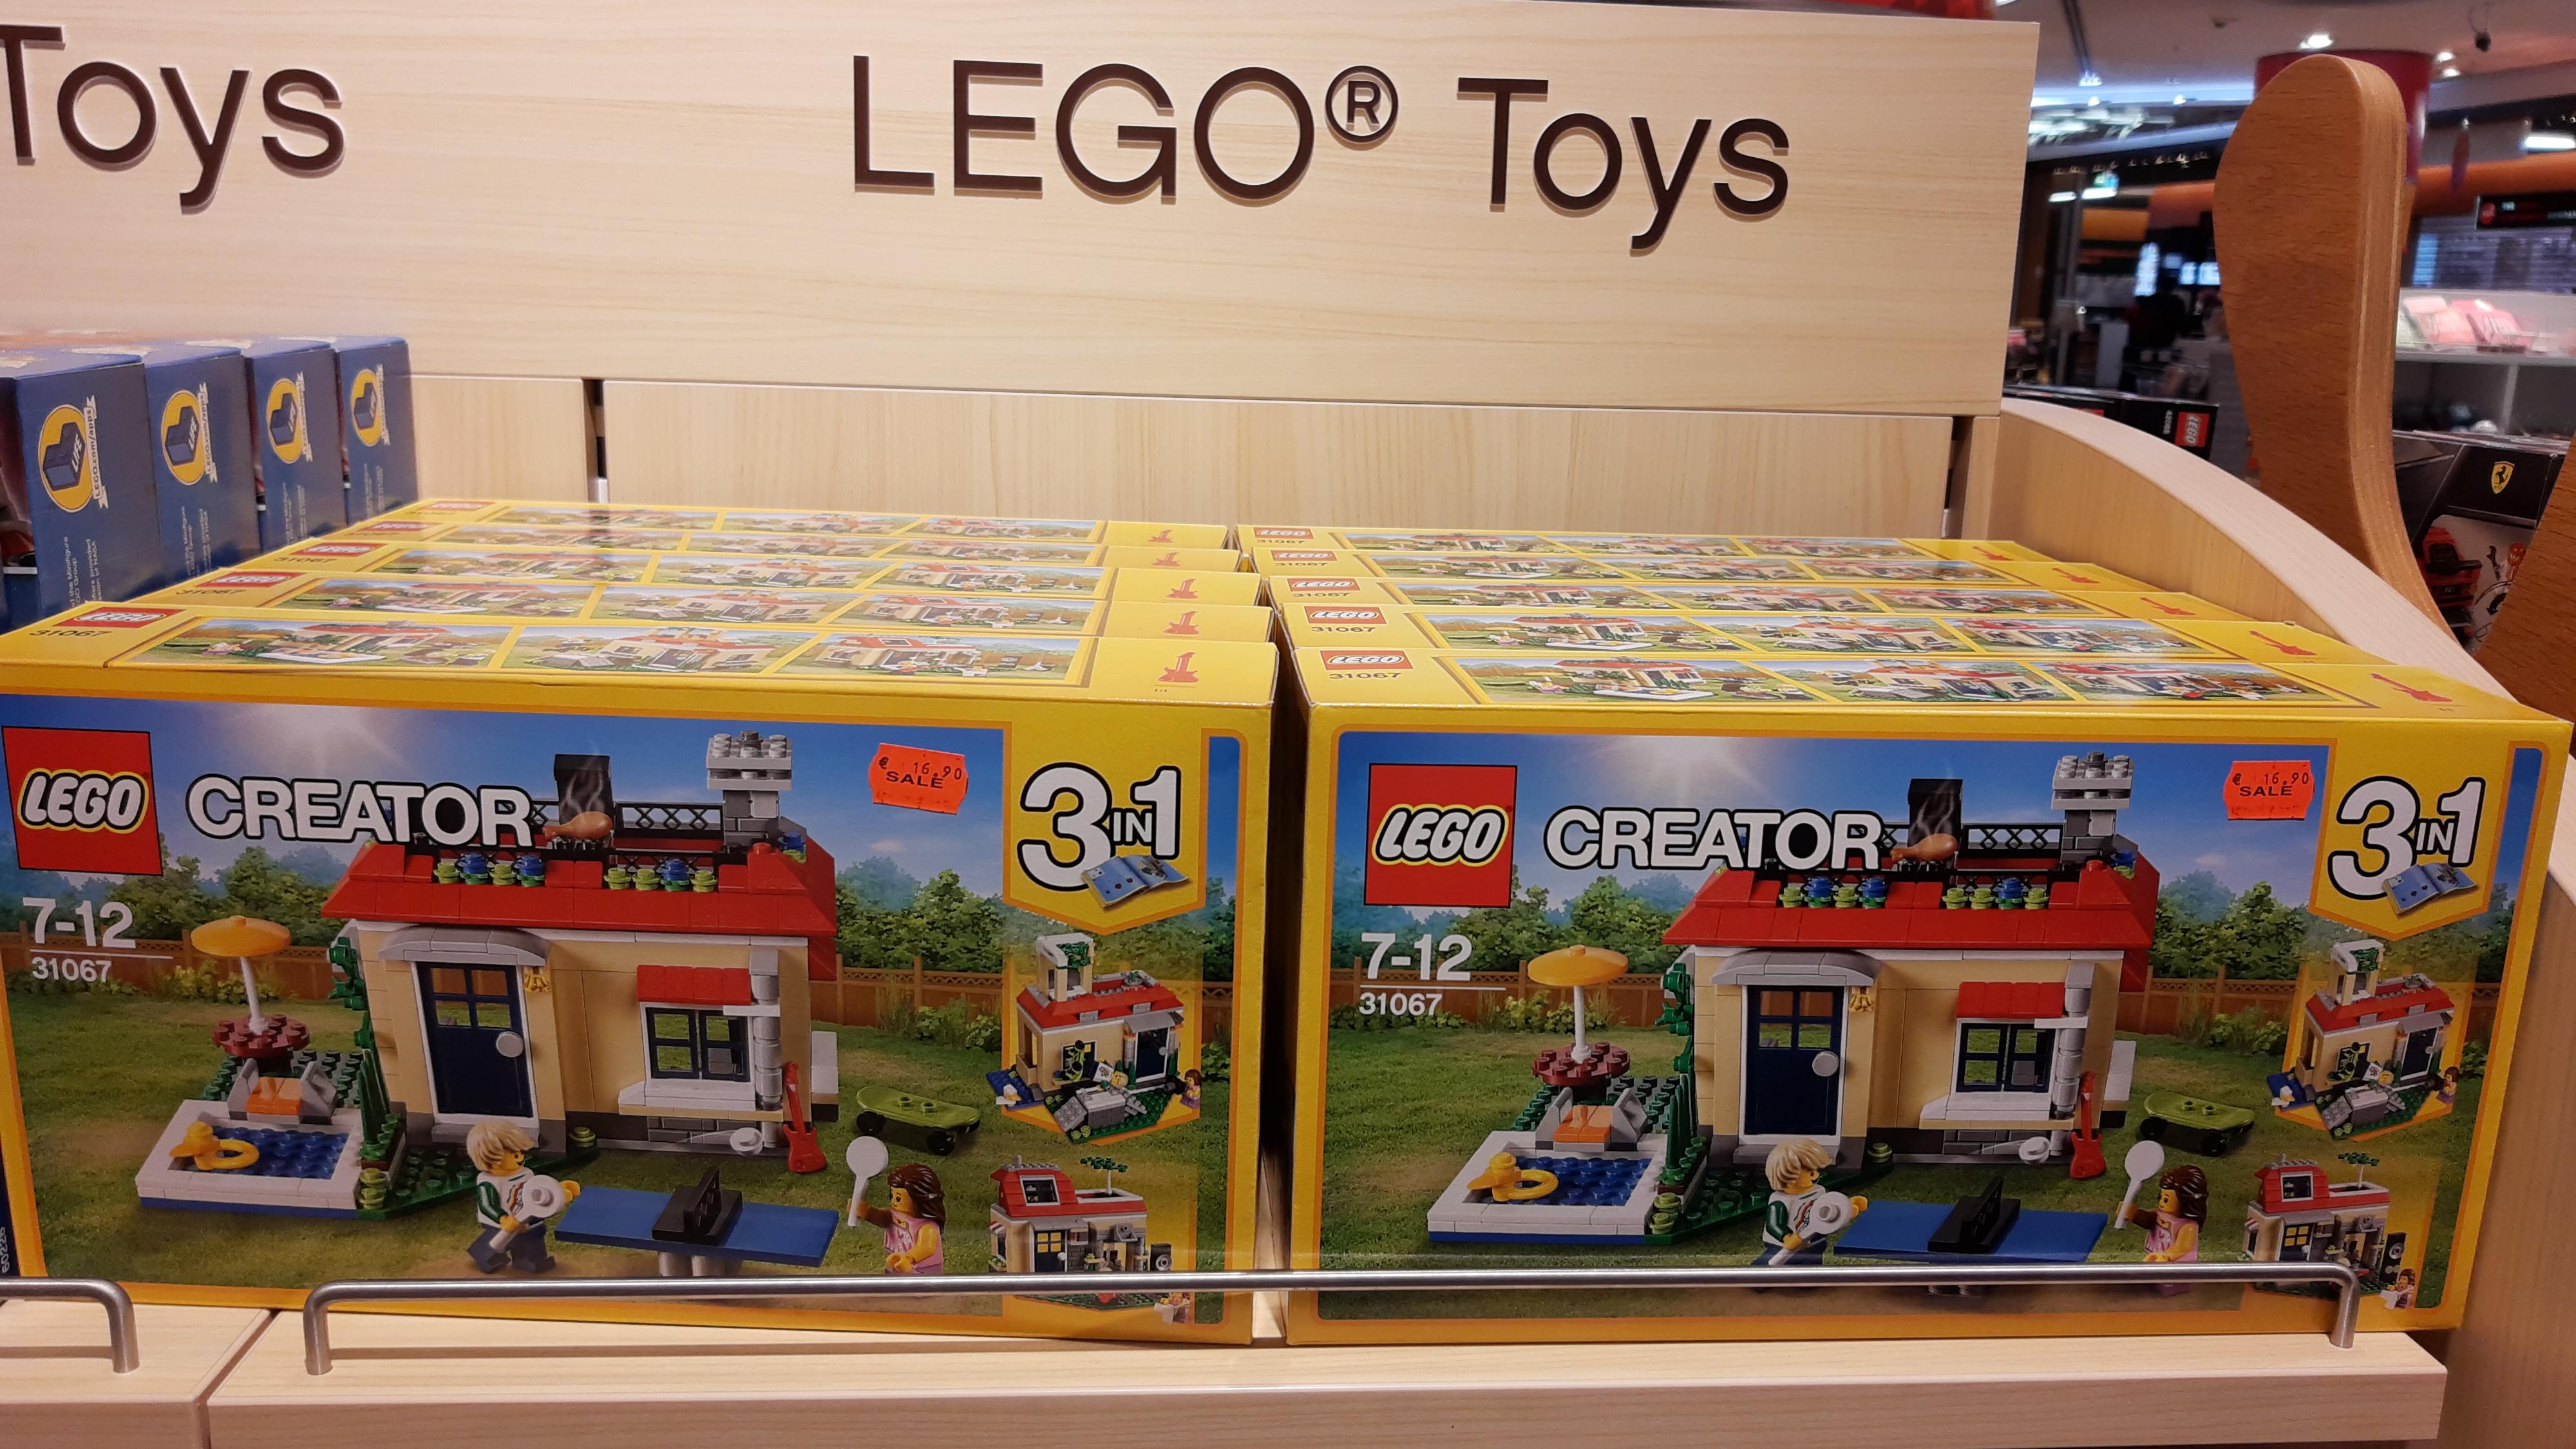 LOKAL Frankfurt Flughafen Duty Free Terminal 2 Gate D - LEGO Creator - 3 in 1 Ferien am Pool (31067) EOL